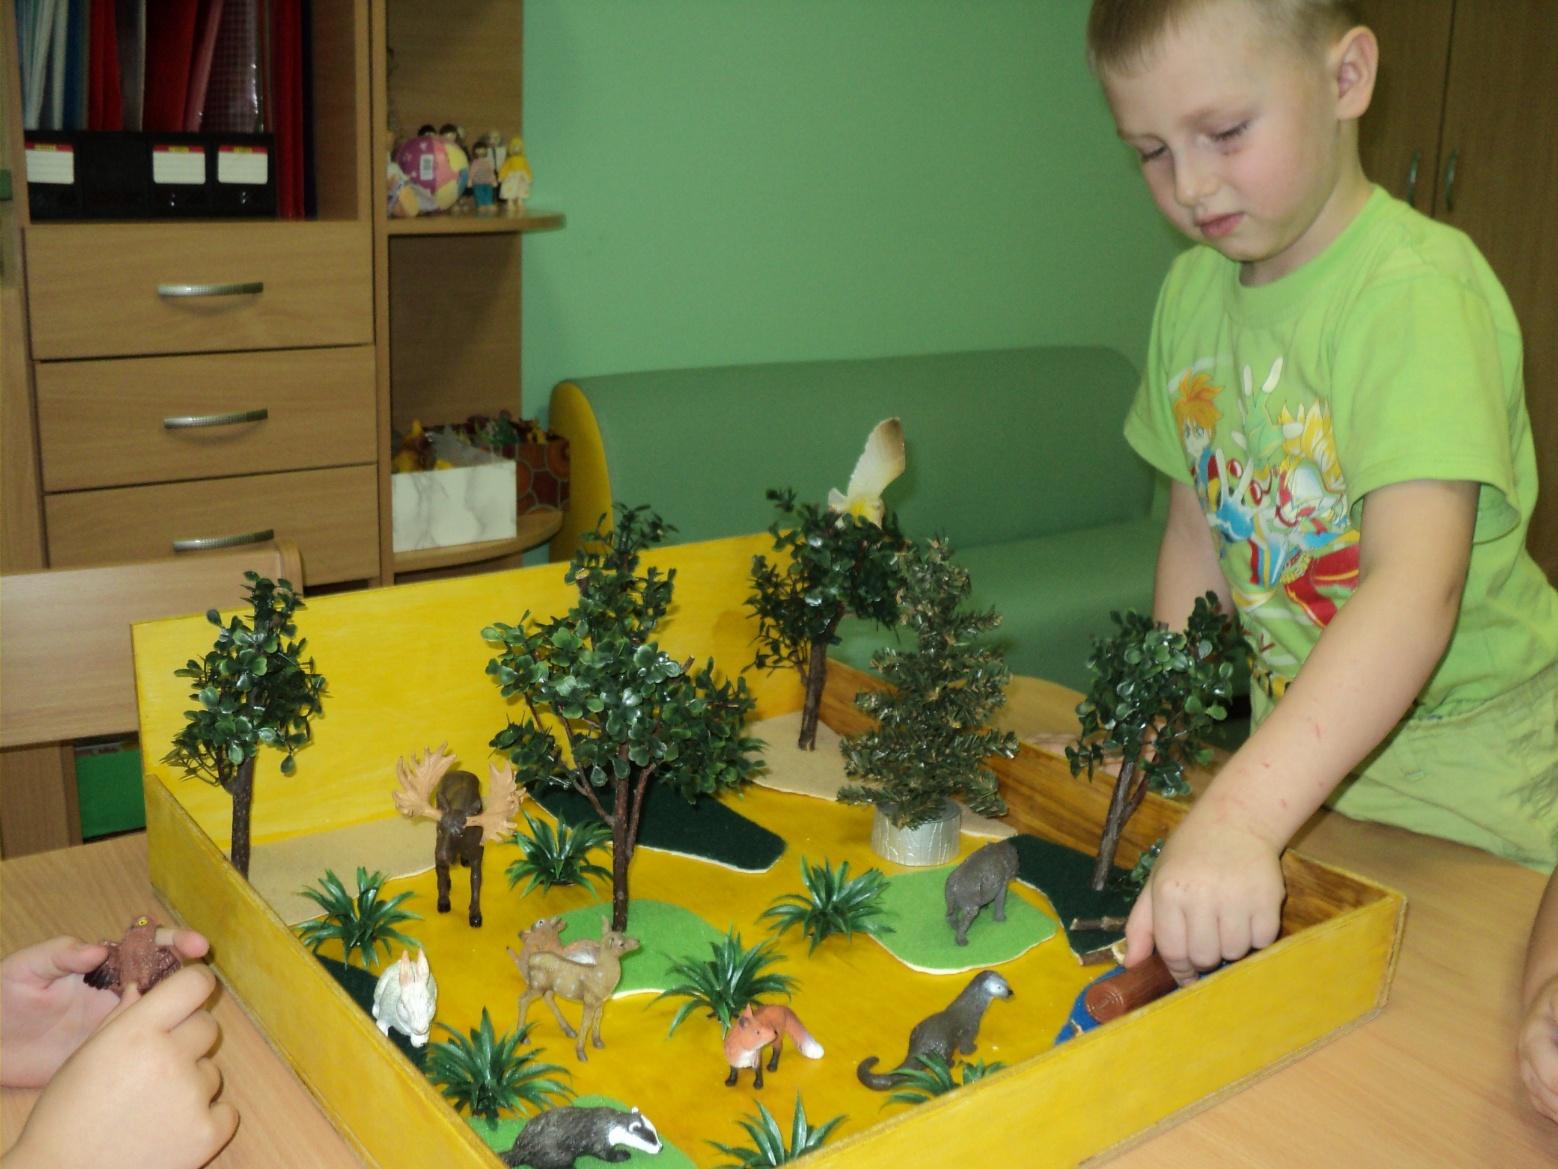 E:\Детскский сад фото\Фото для проекта\DSC01110.JPG